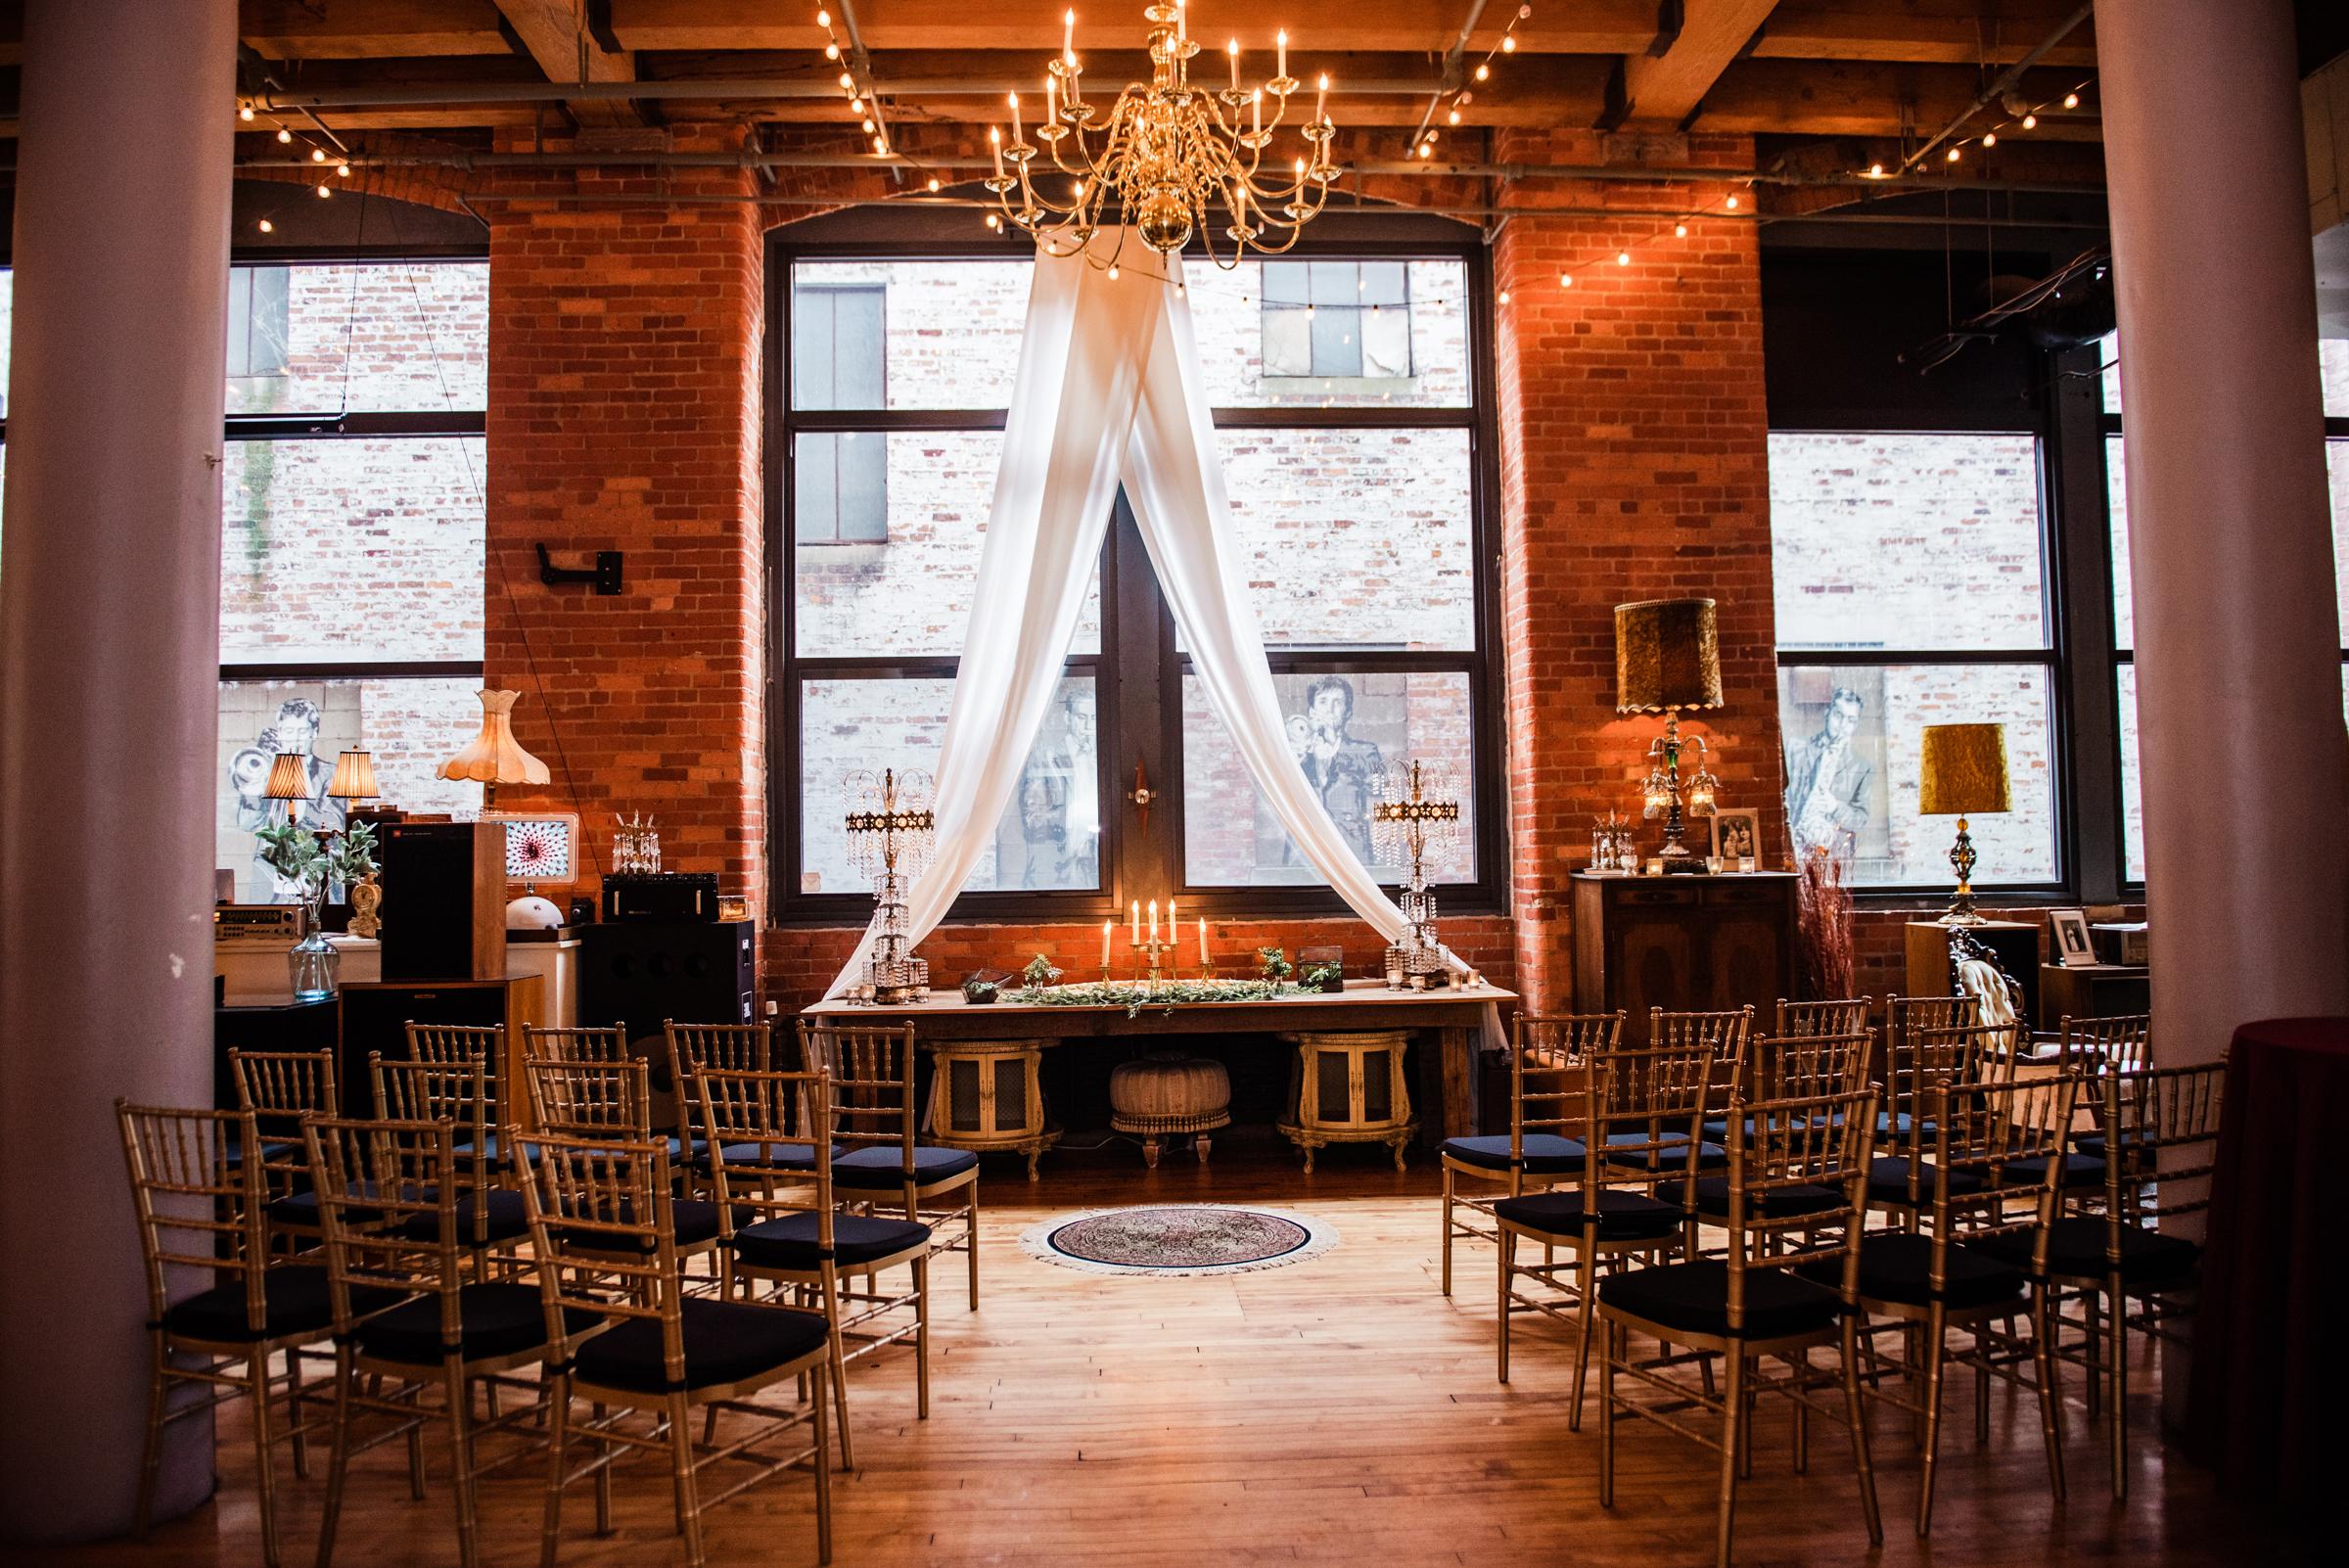 Studio_180_Lamberton_Conservatory_Rochester_Wedding_JILL_STUDIO_Rochester_NY_Photographer_DSC_8834.jpg